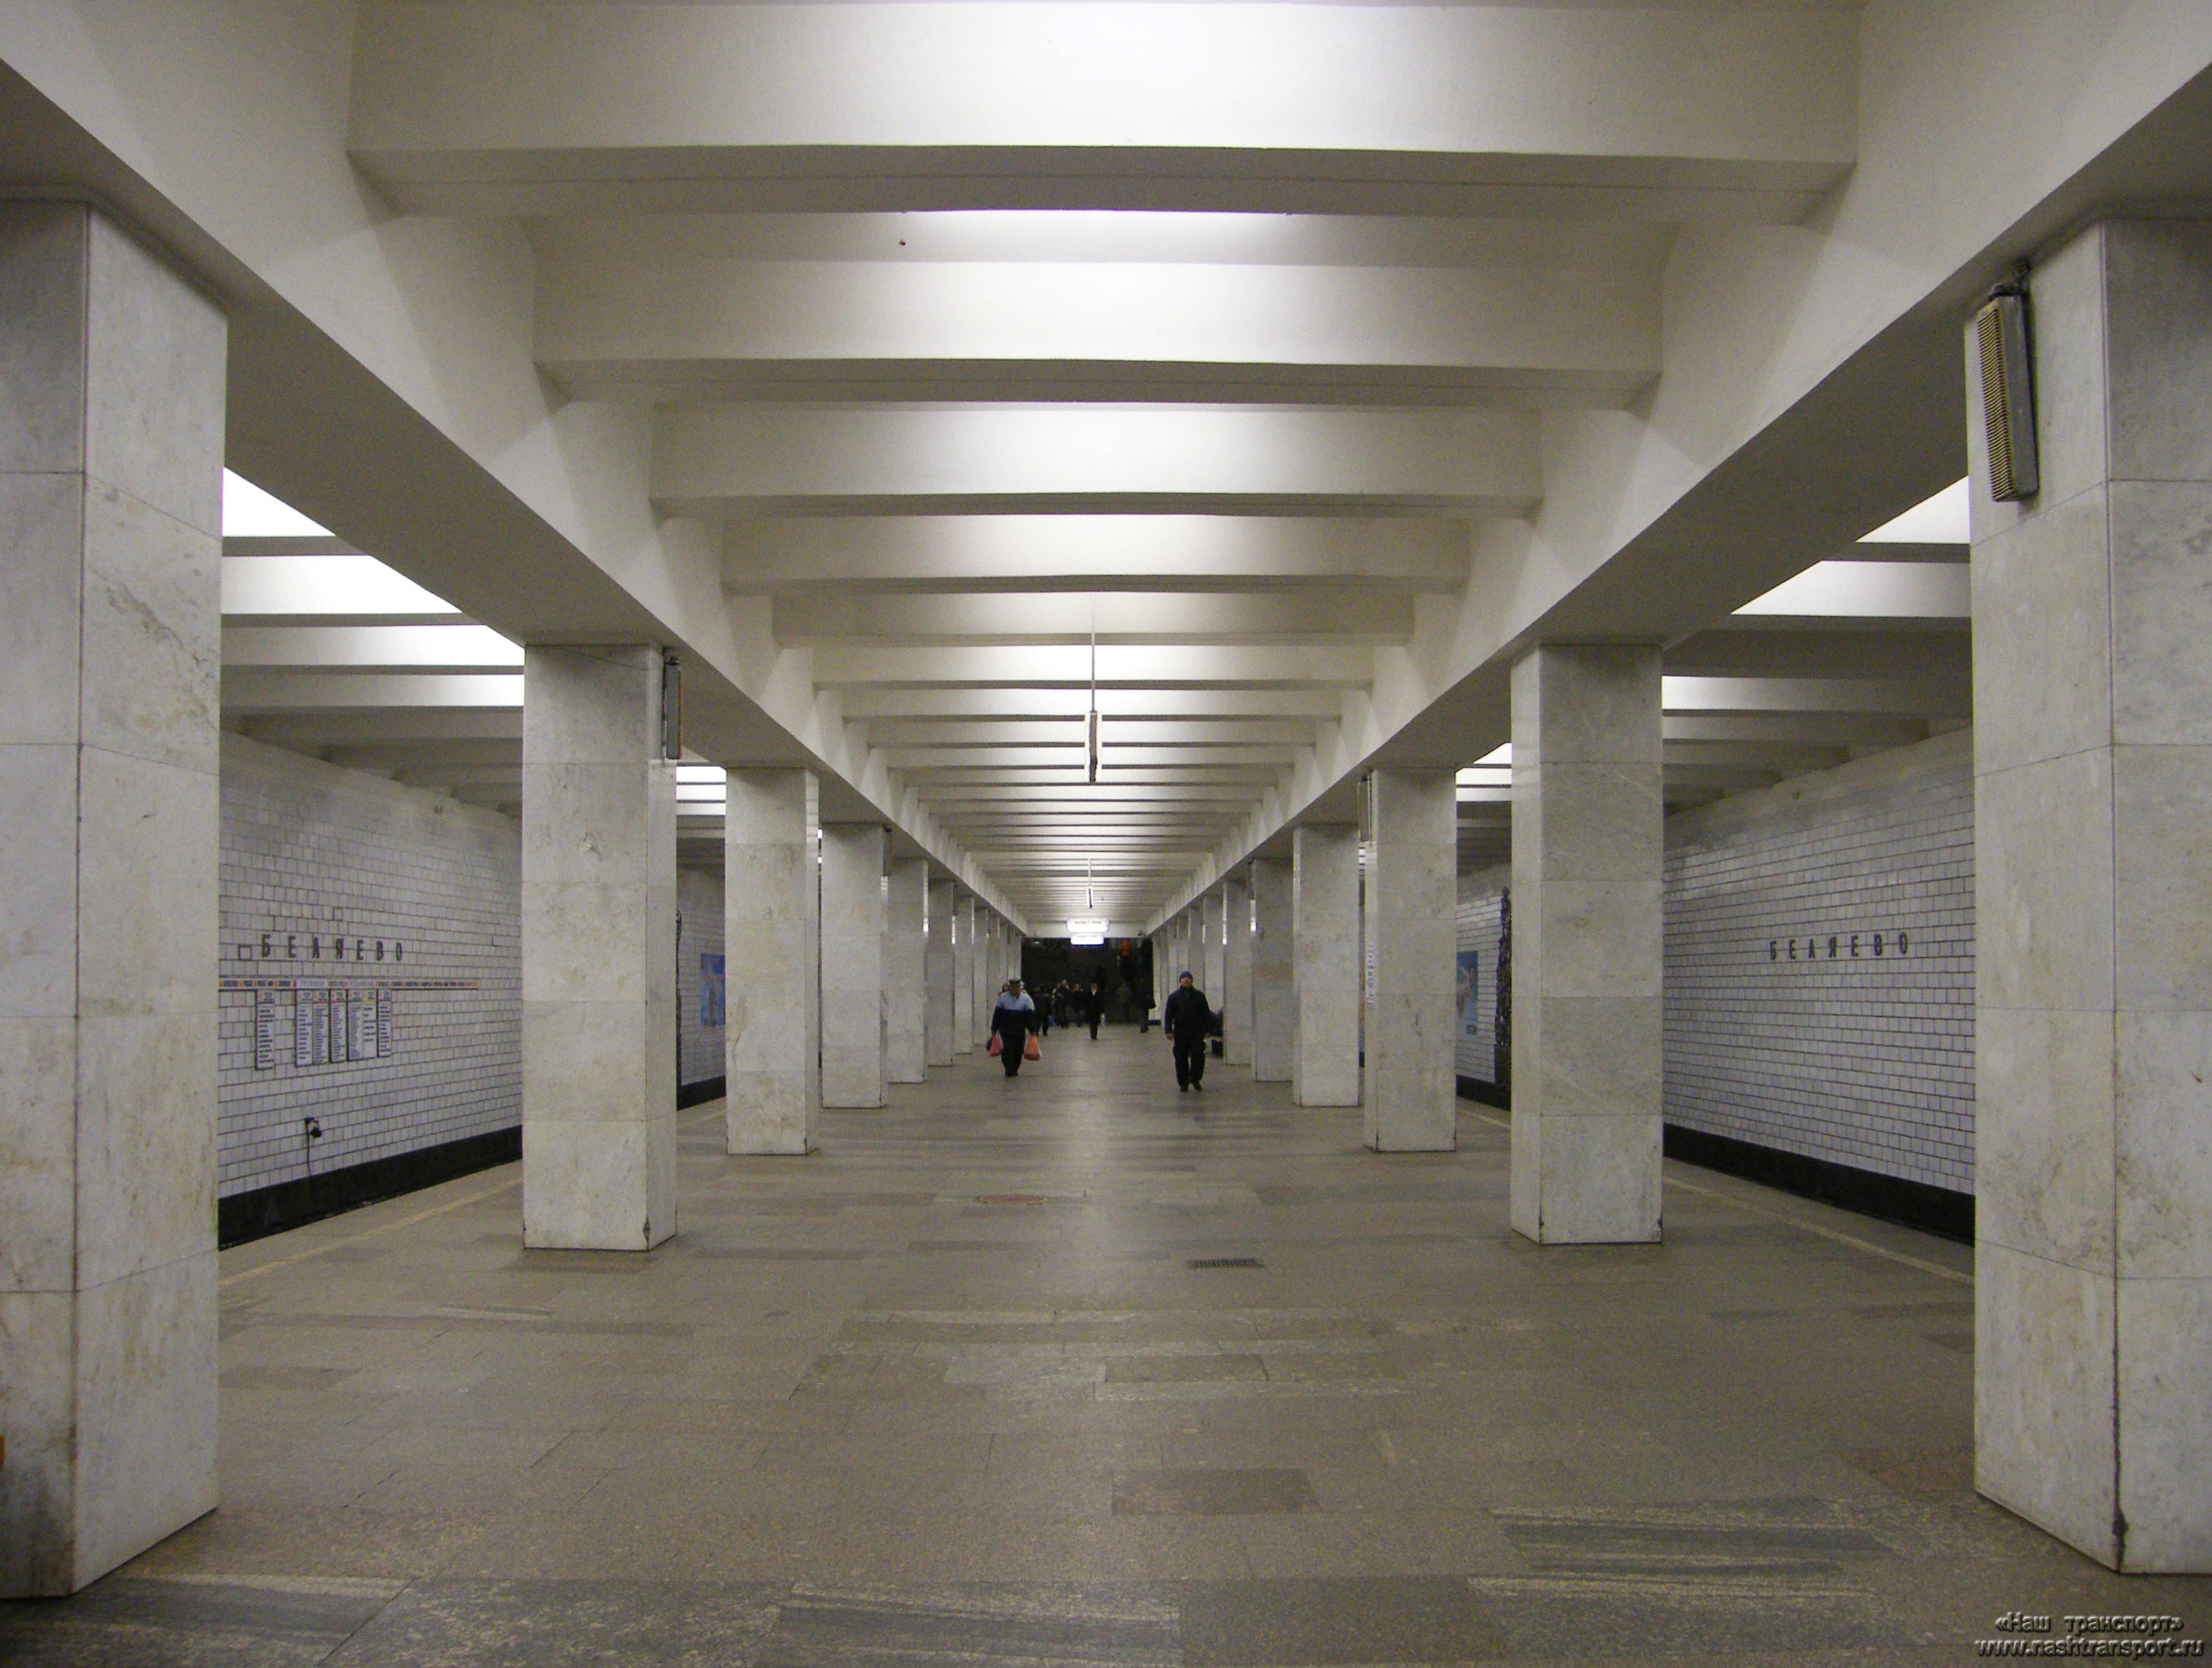 Путаны москвы дешевые метро 11 фотография